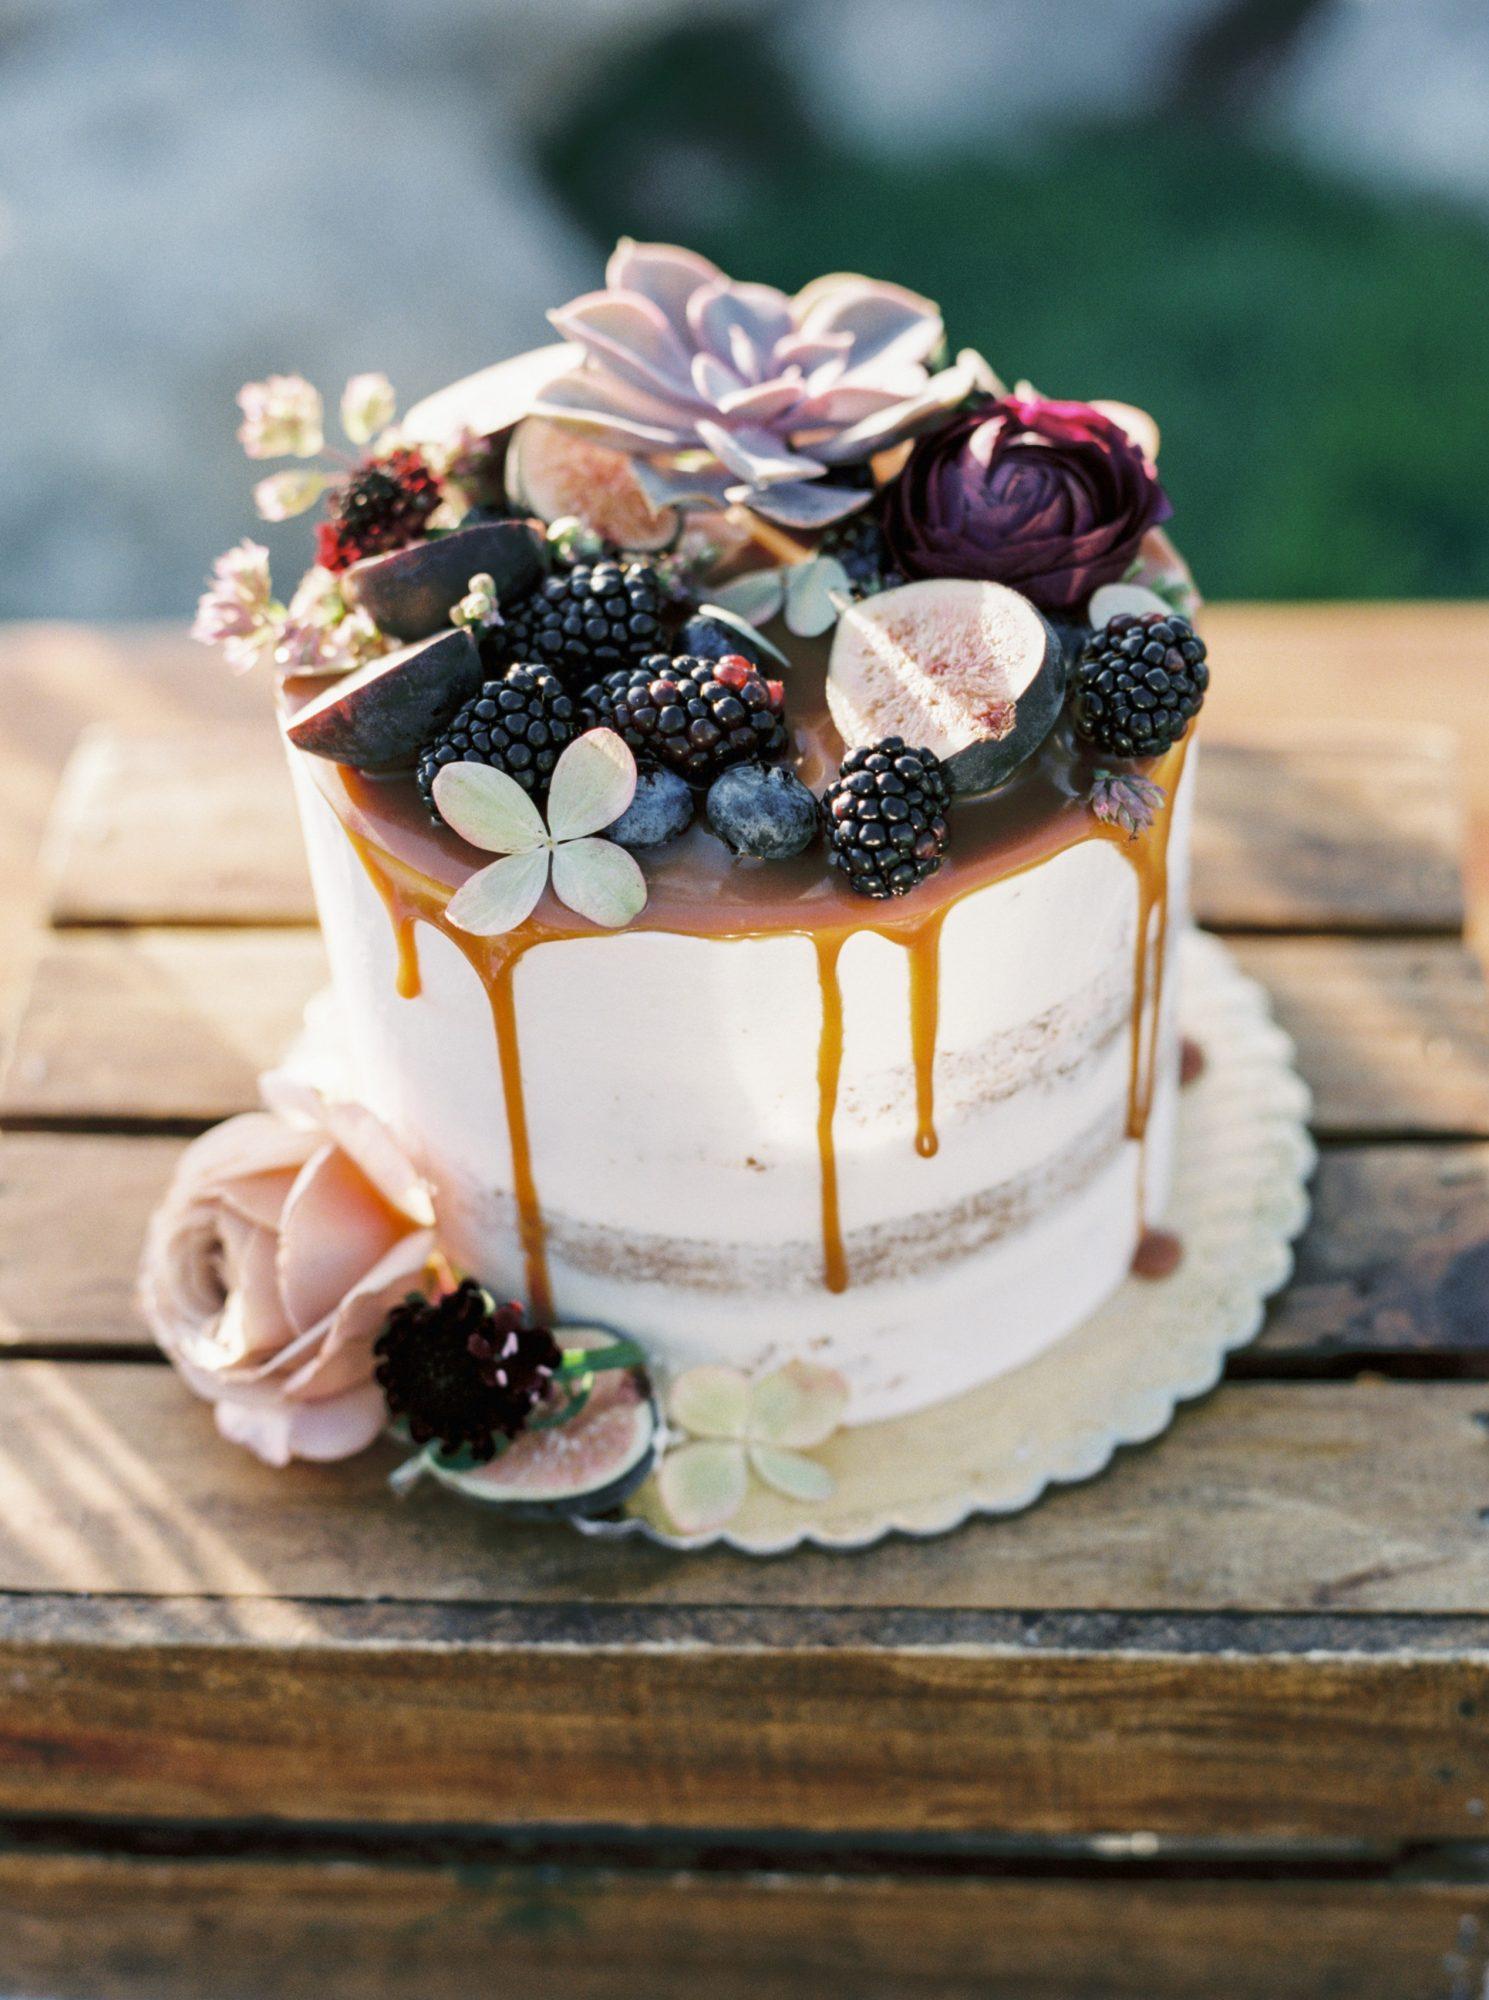 Dripping taart met vruchten